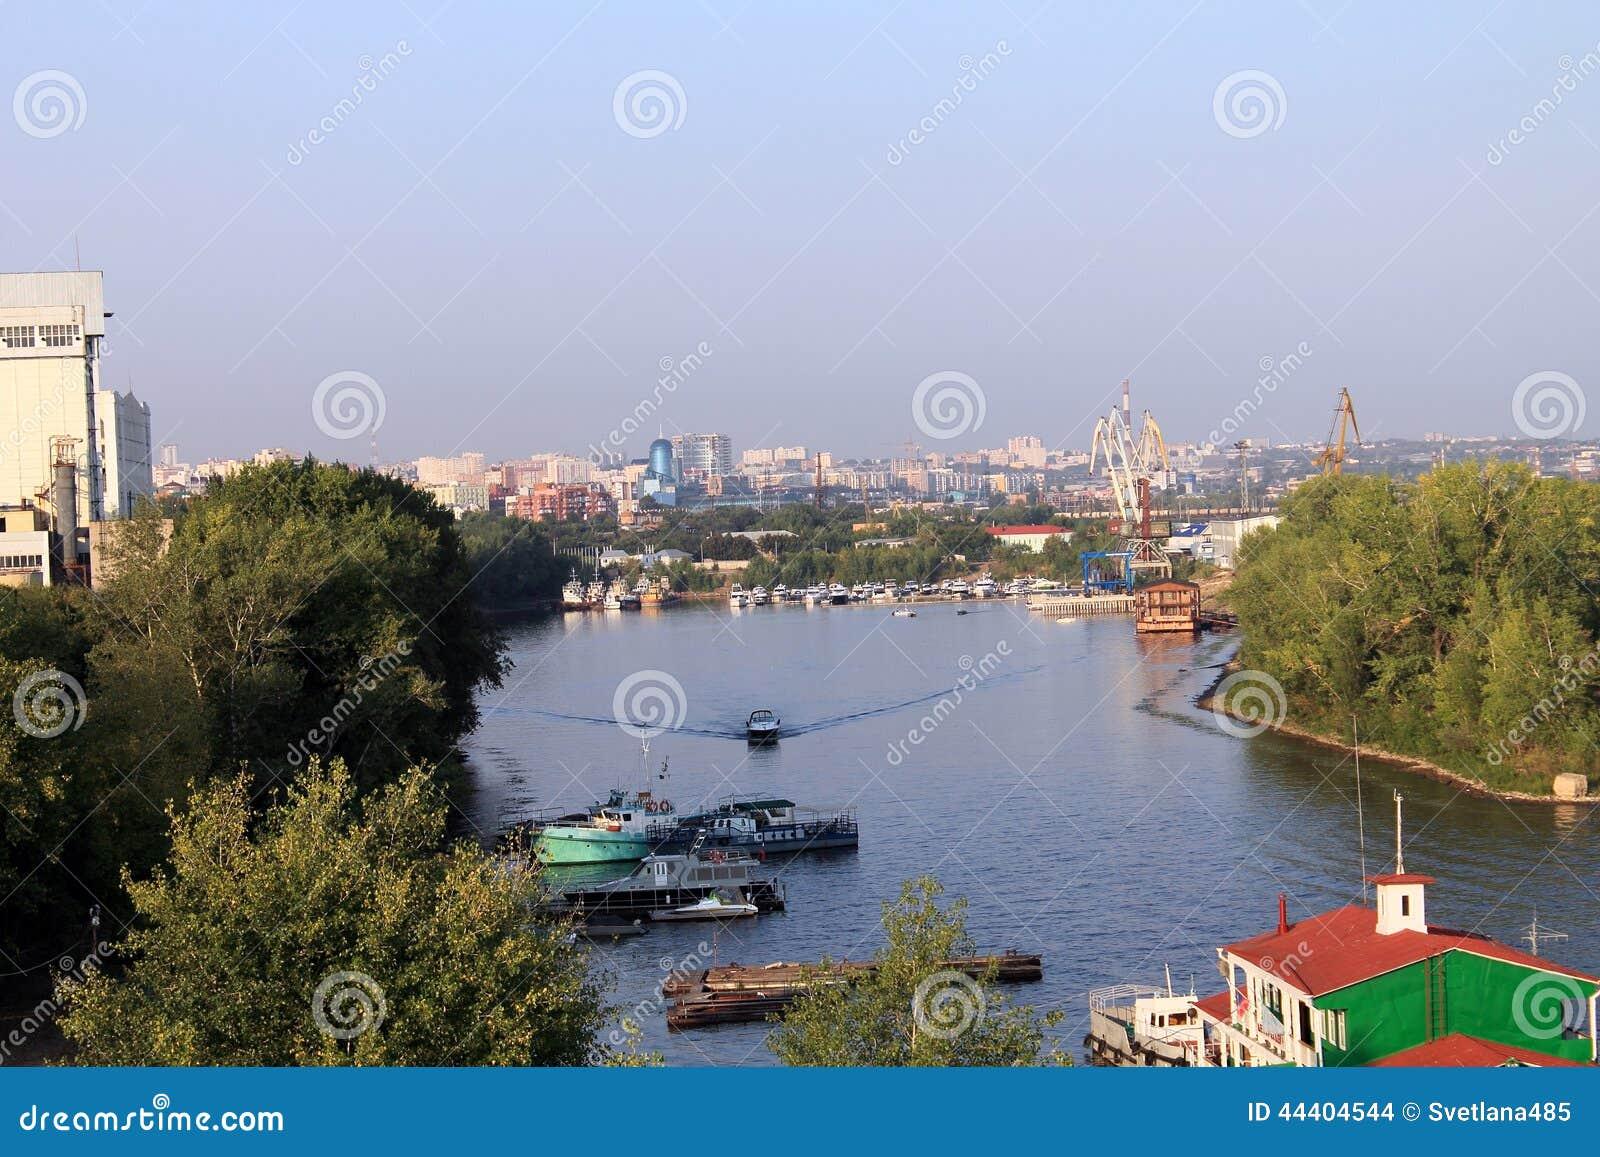 Samara Russia  city photos : Samara, Russia August 15, 2014: the Volga River. Boats floating on ...